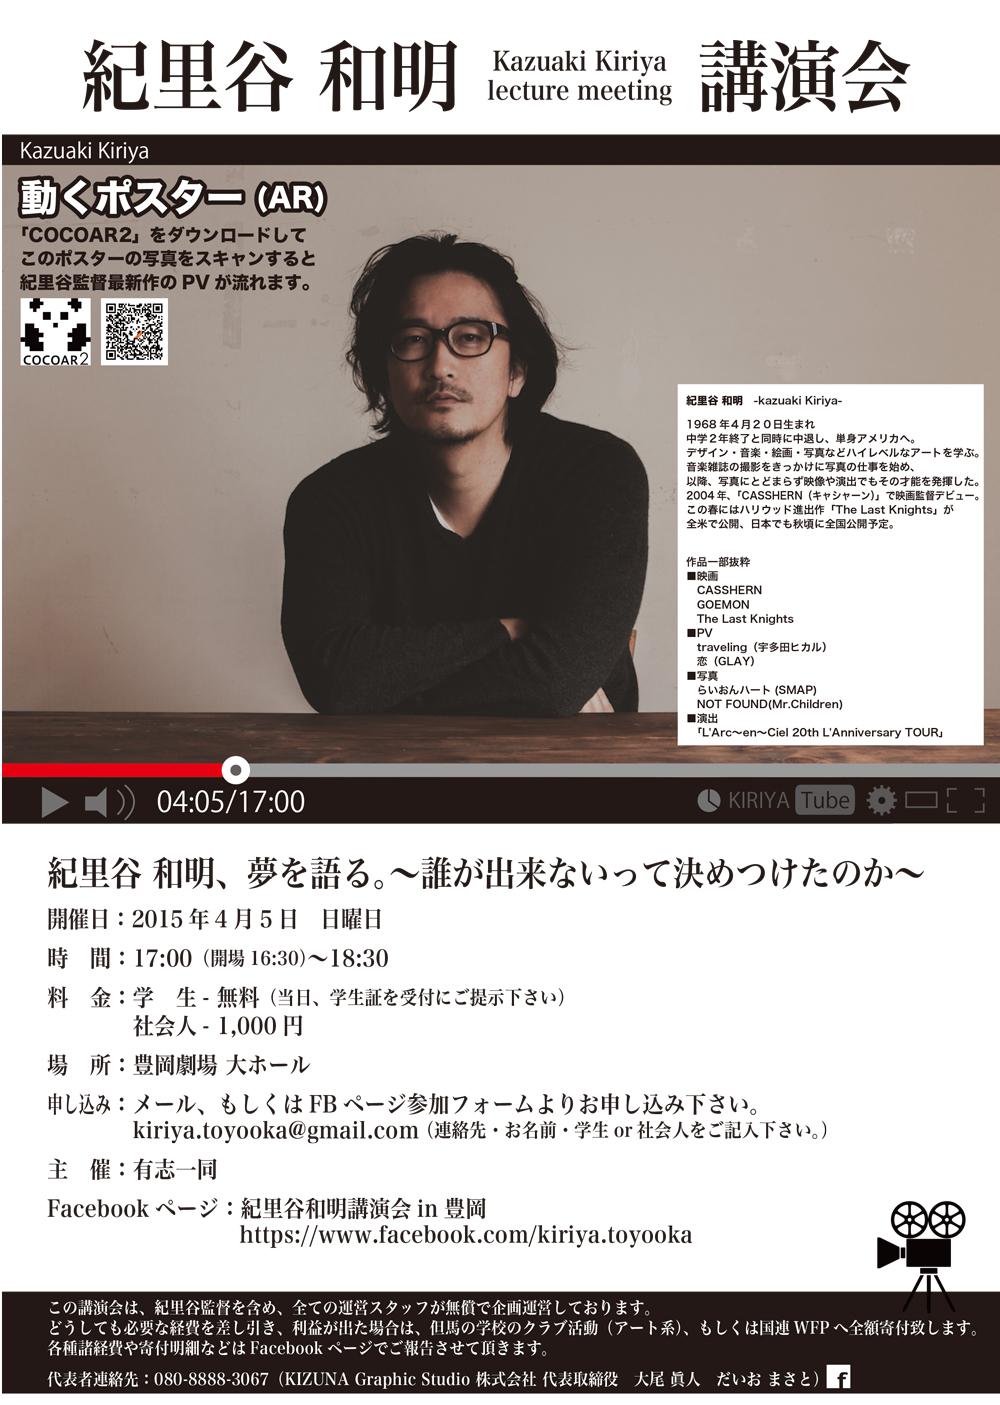 kazuaki_kiriya